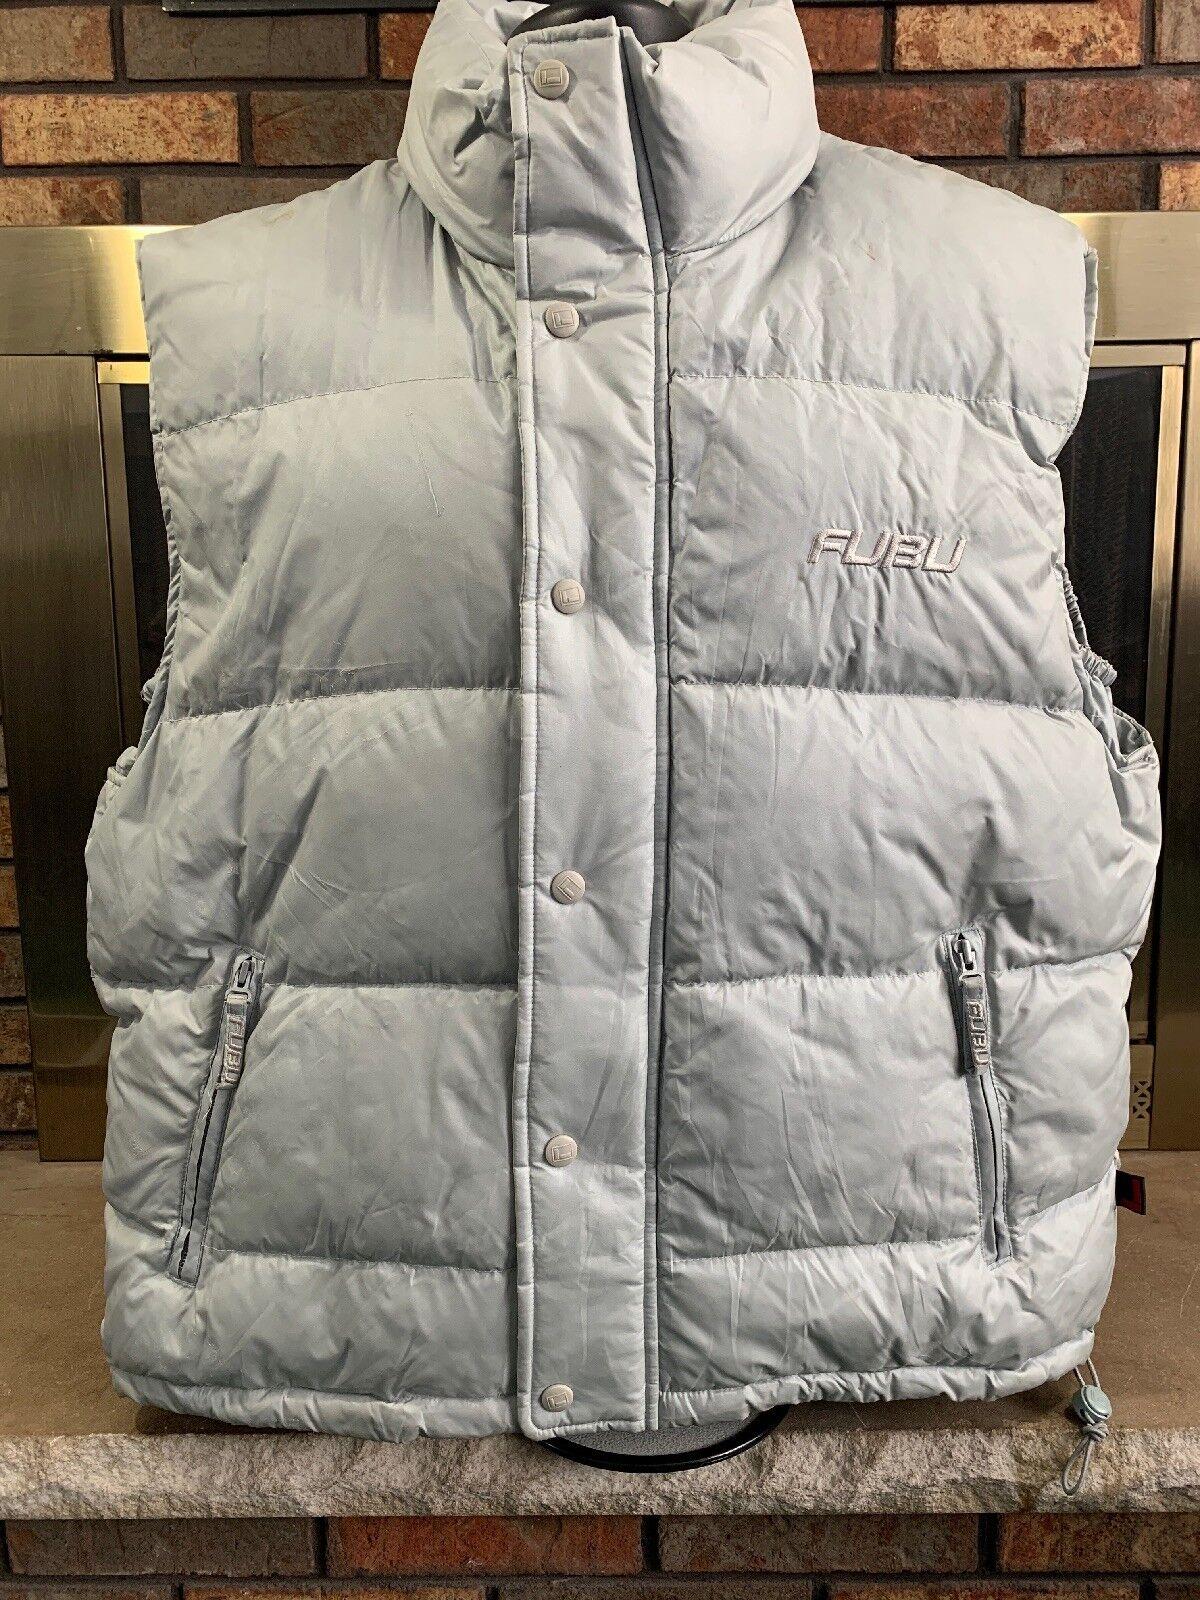 Fubu Men's Ski Puffer Vest Zip Up Button Up Size Large Grey Warm Winter Vintage